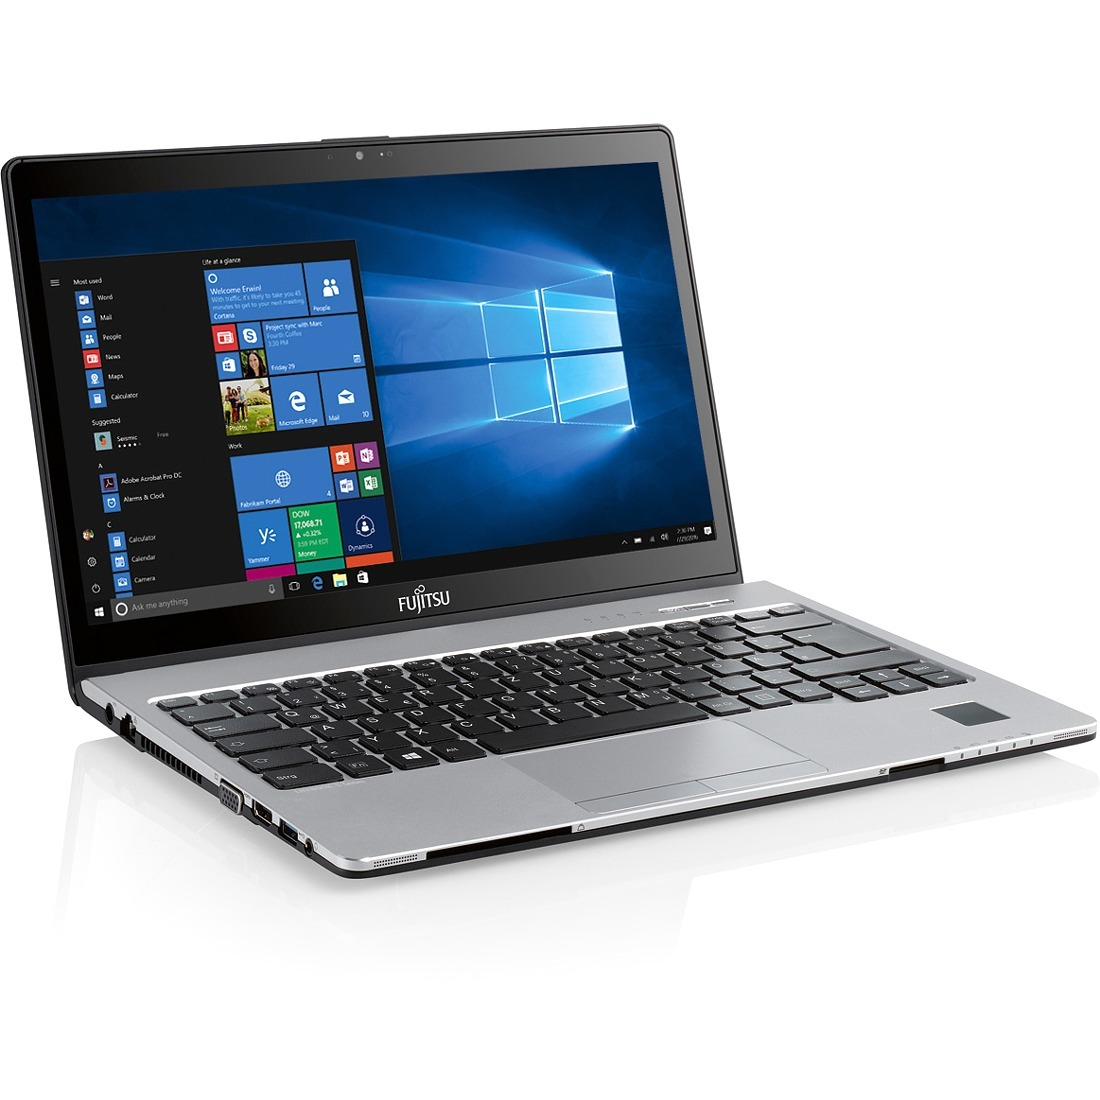 Fujitsu LIFEBOOK S937 33.8 cm 13.3inch LCD Notebook - Intel Core i5 7th Gen i5-7200U Dual-core 2 Core 2.50 GHz - 8 GB DDR4 SDRAM - 256 GB SSD - Windows 10 Pro 64-